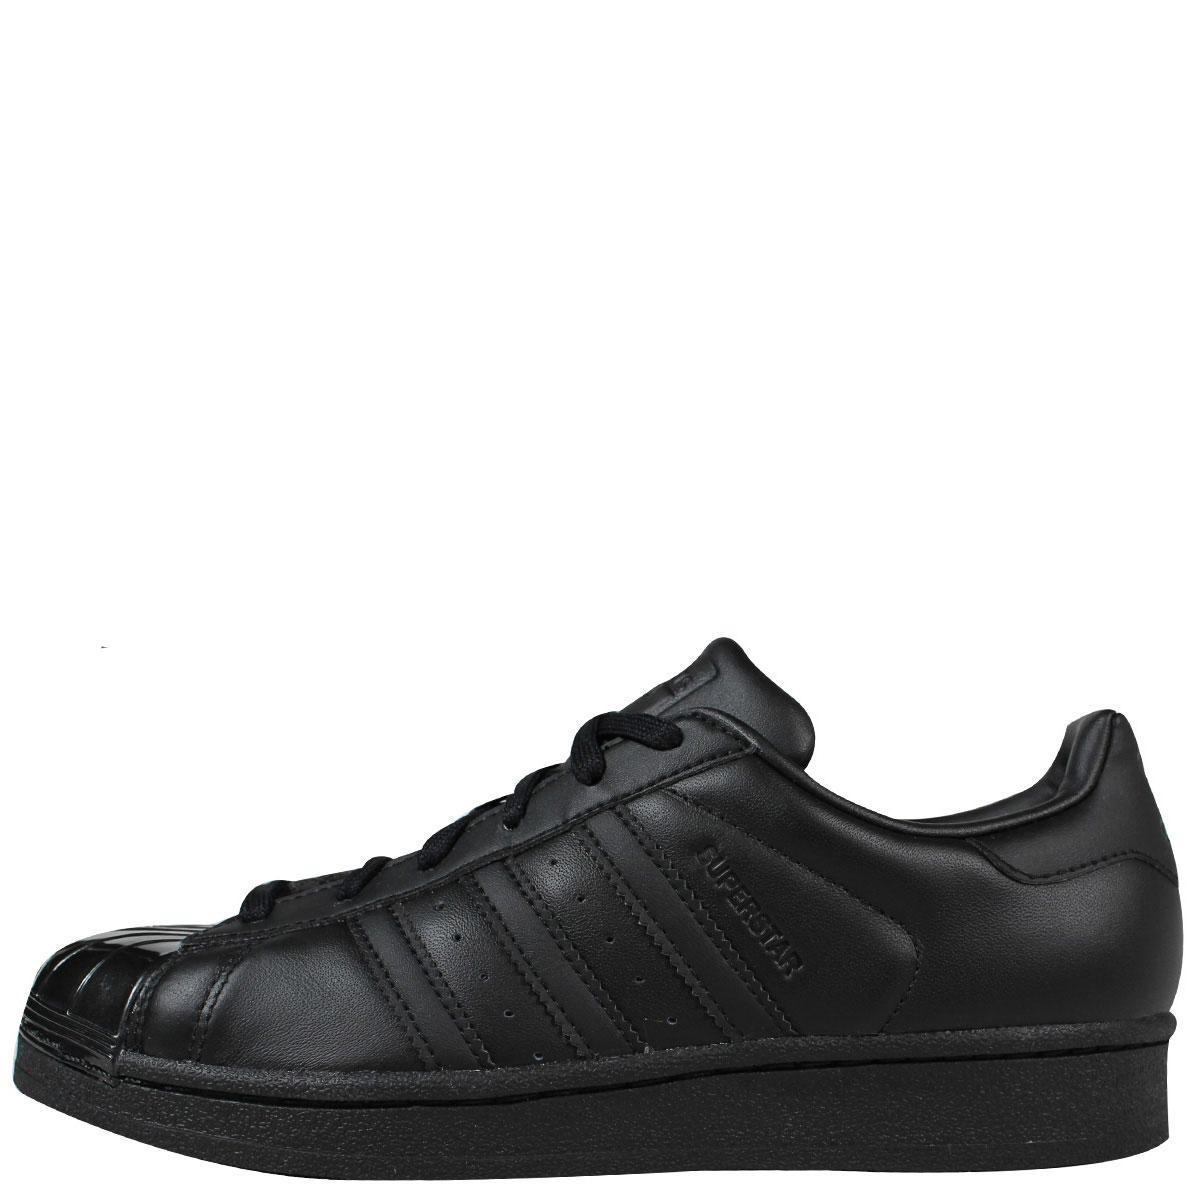 adidas shoes originals superstar sneakers